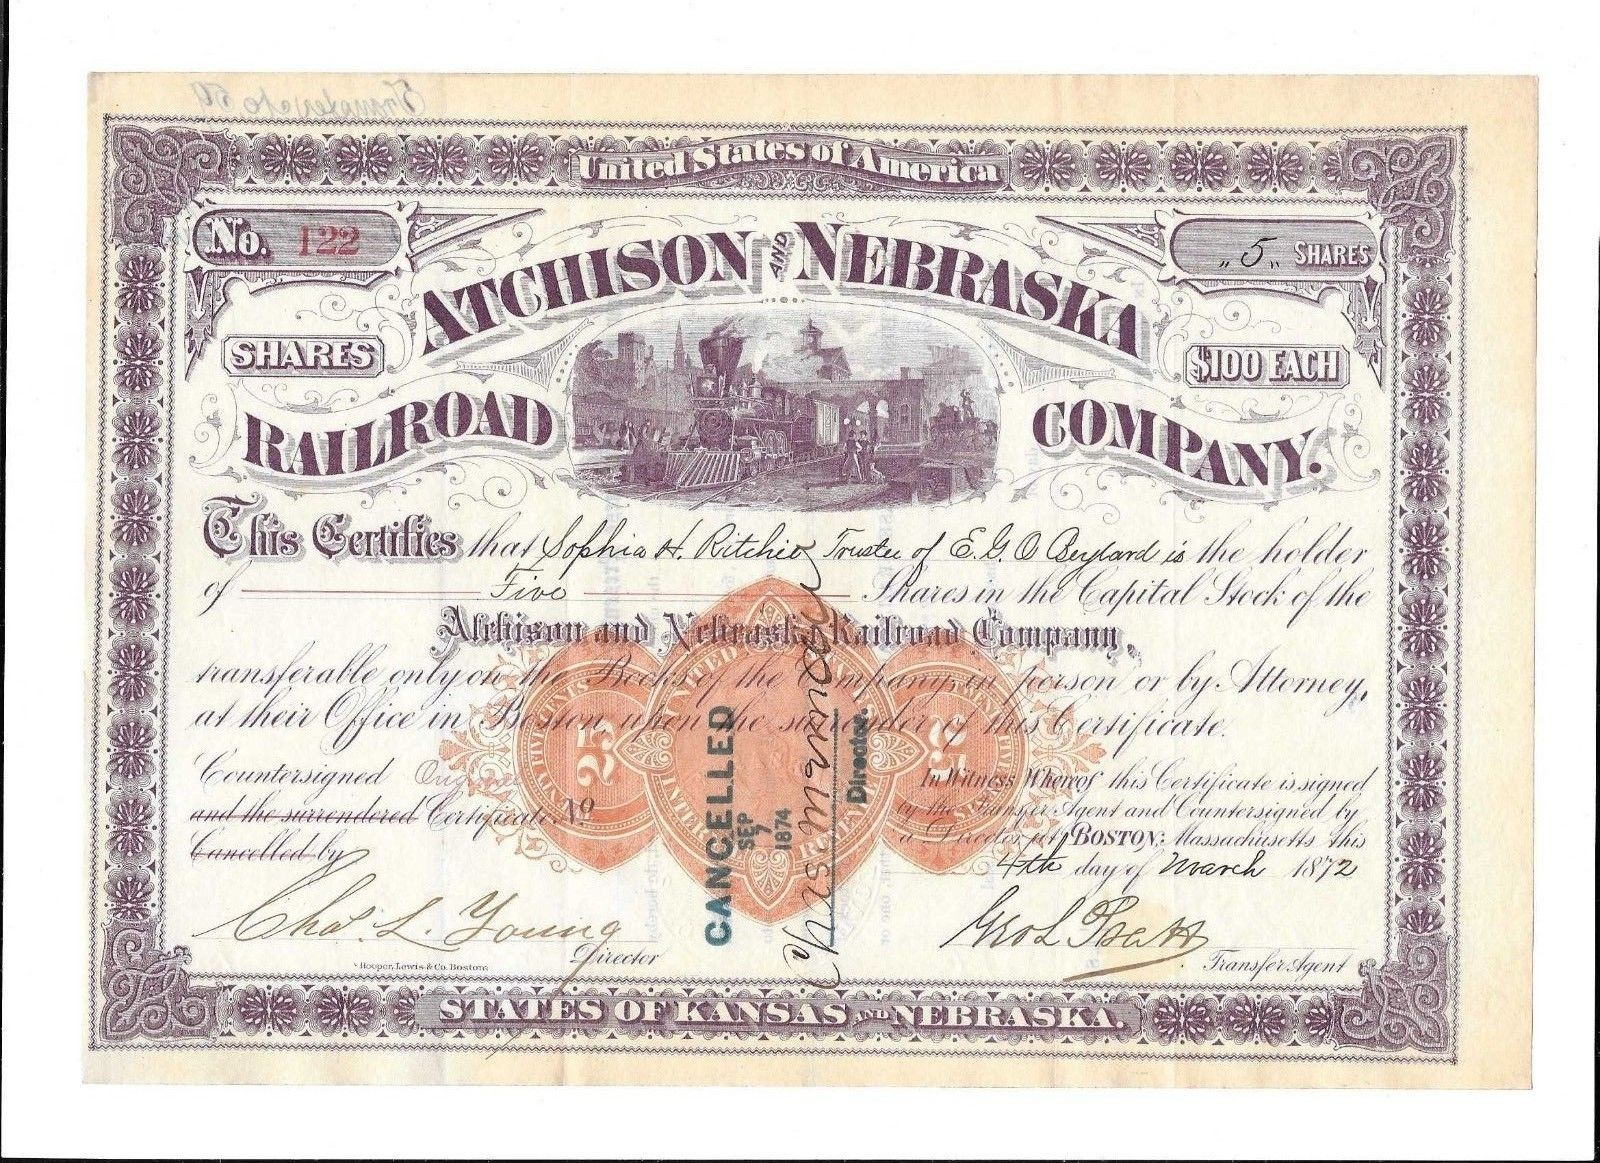 ATC-429-S-40  ic  $50  1872 Atchison and Nebraska Railroad train (funn.jpg